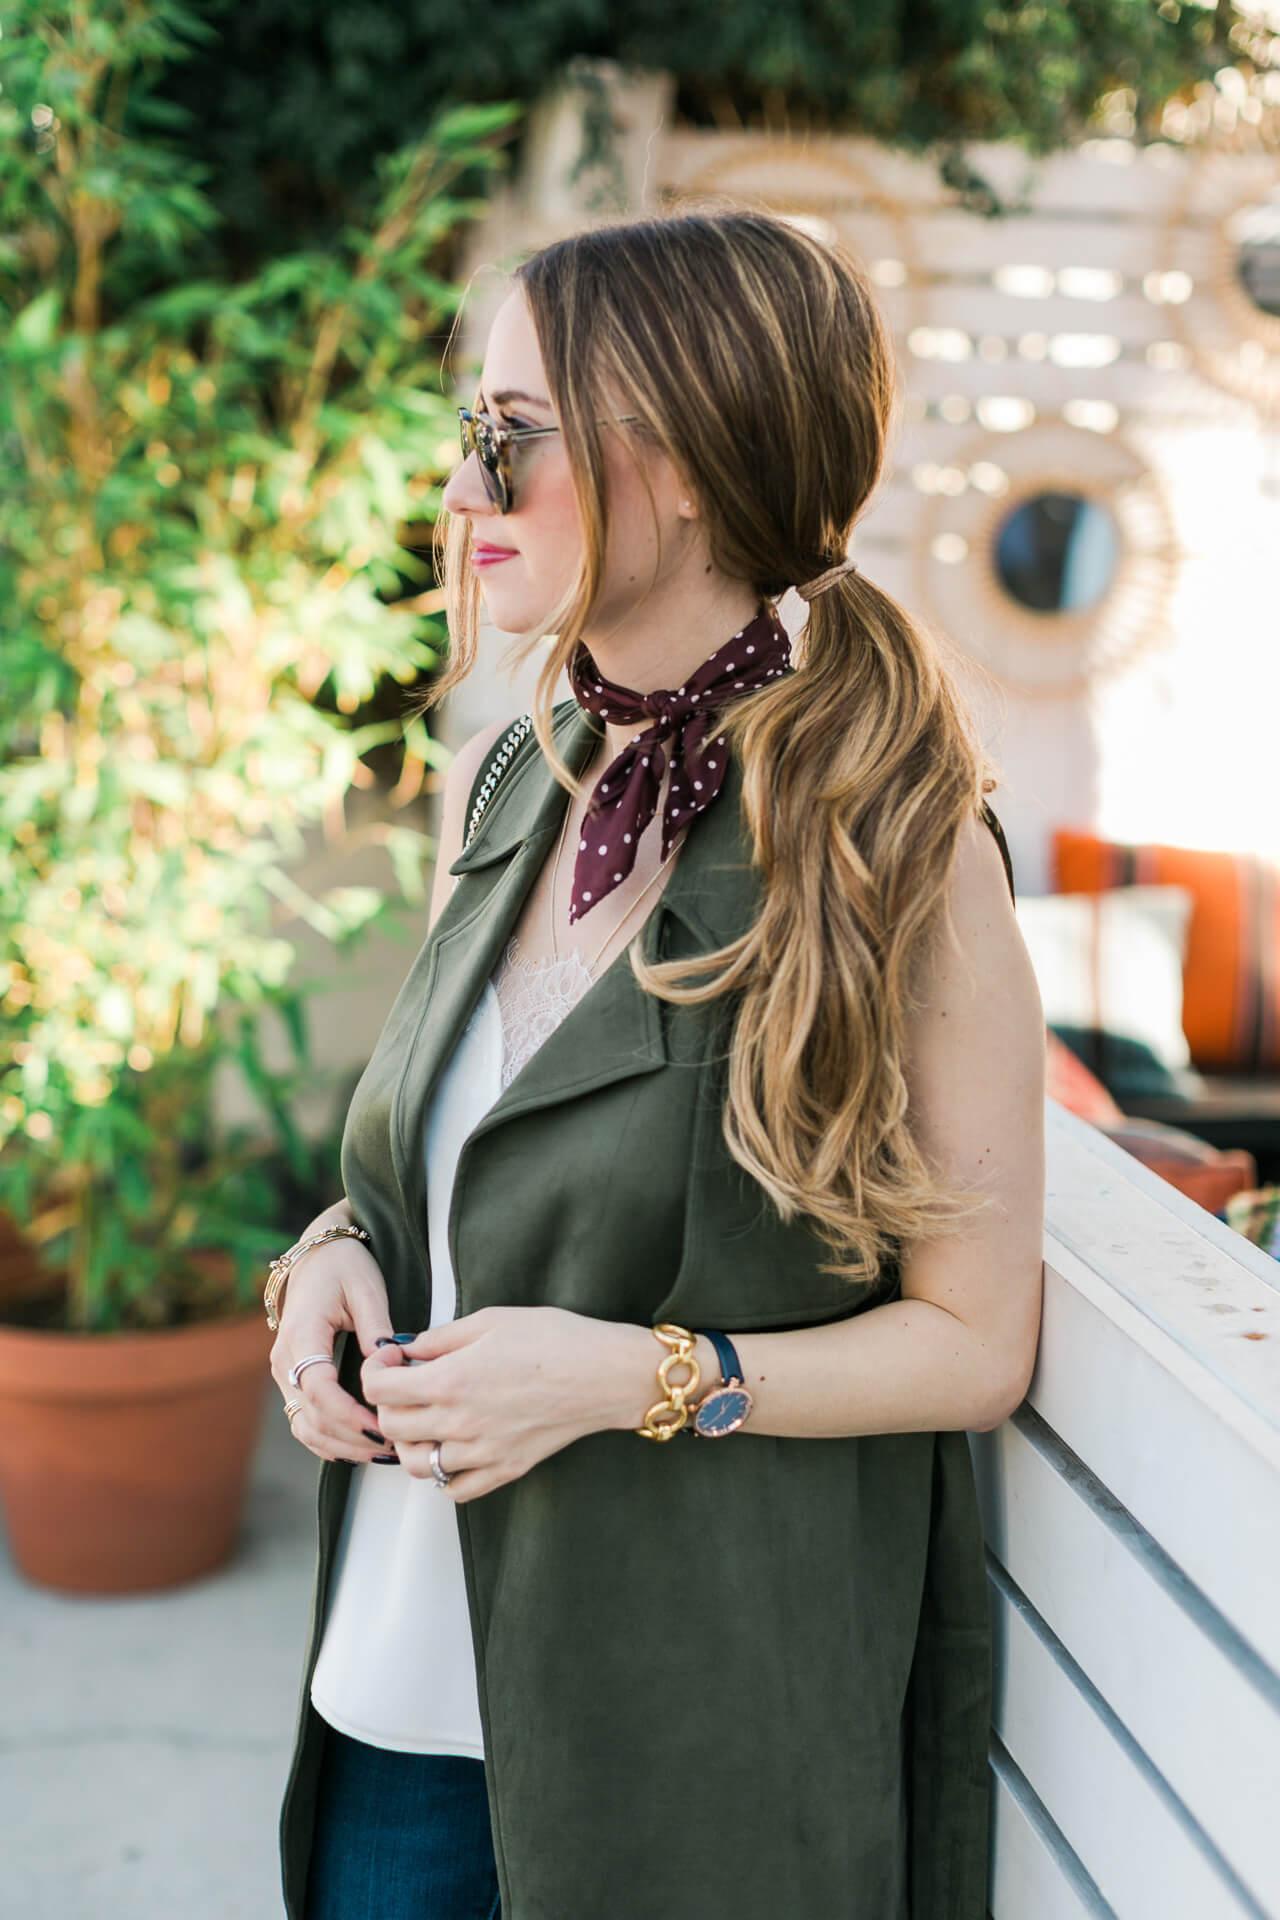 styling a polka dot necktie